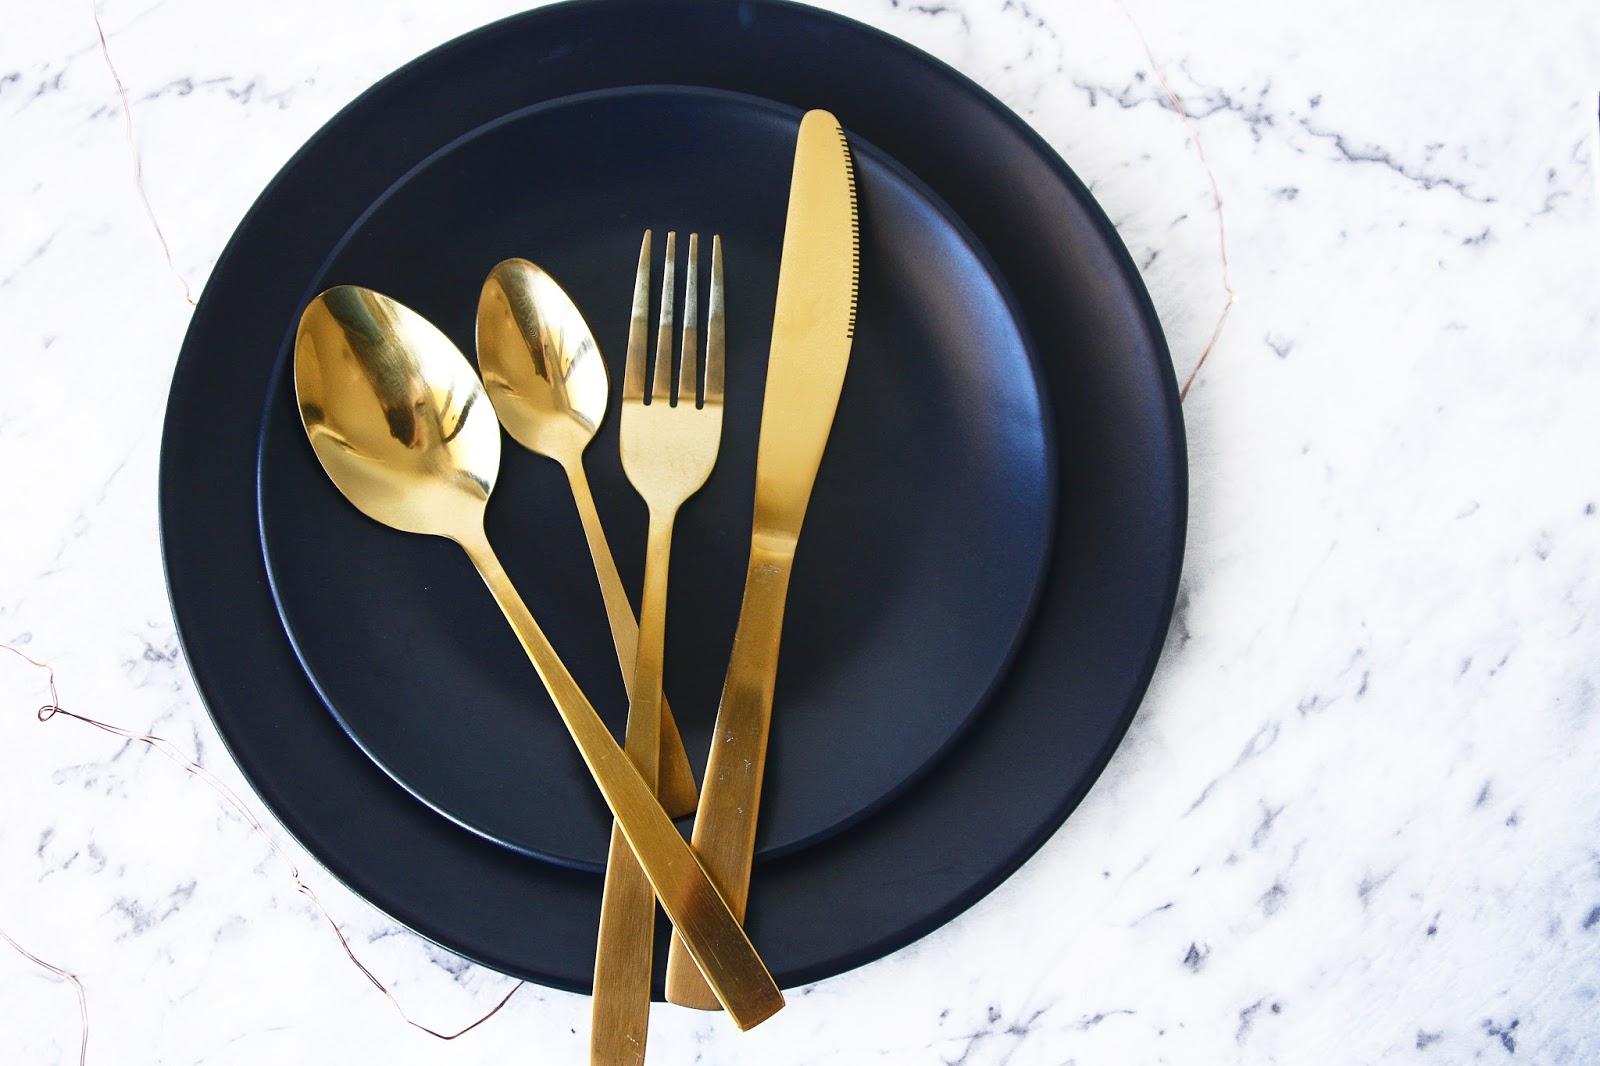 16- Piece Gold Cutlery Set / Matte Black Tableware (Dinner Plates Side Plates Bowls) & Kmart Haul #2 | The Noise in Wonderland